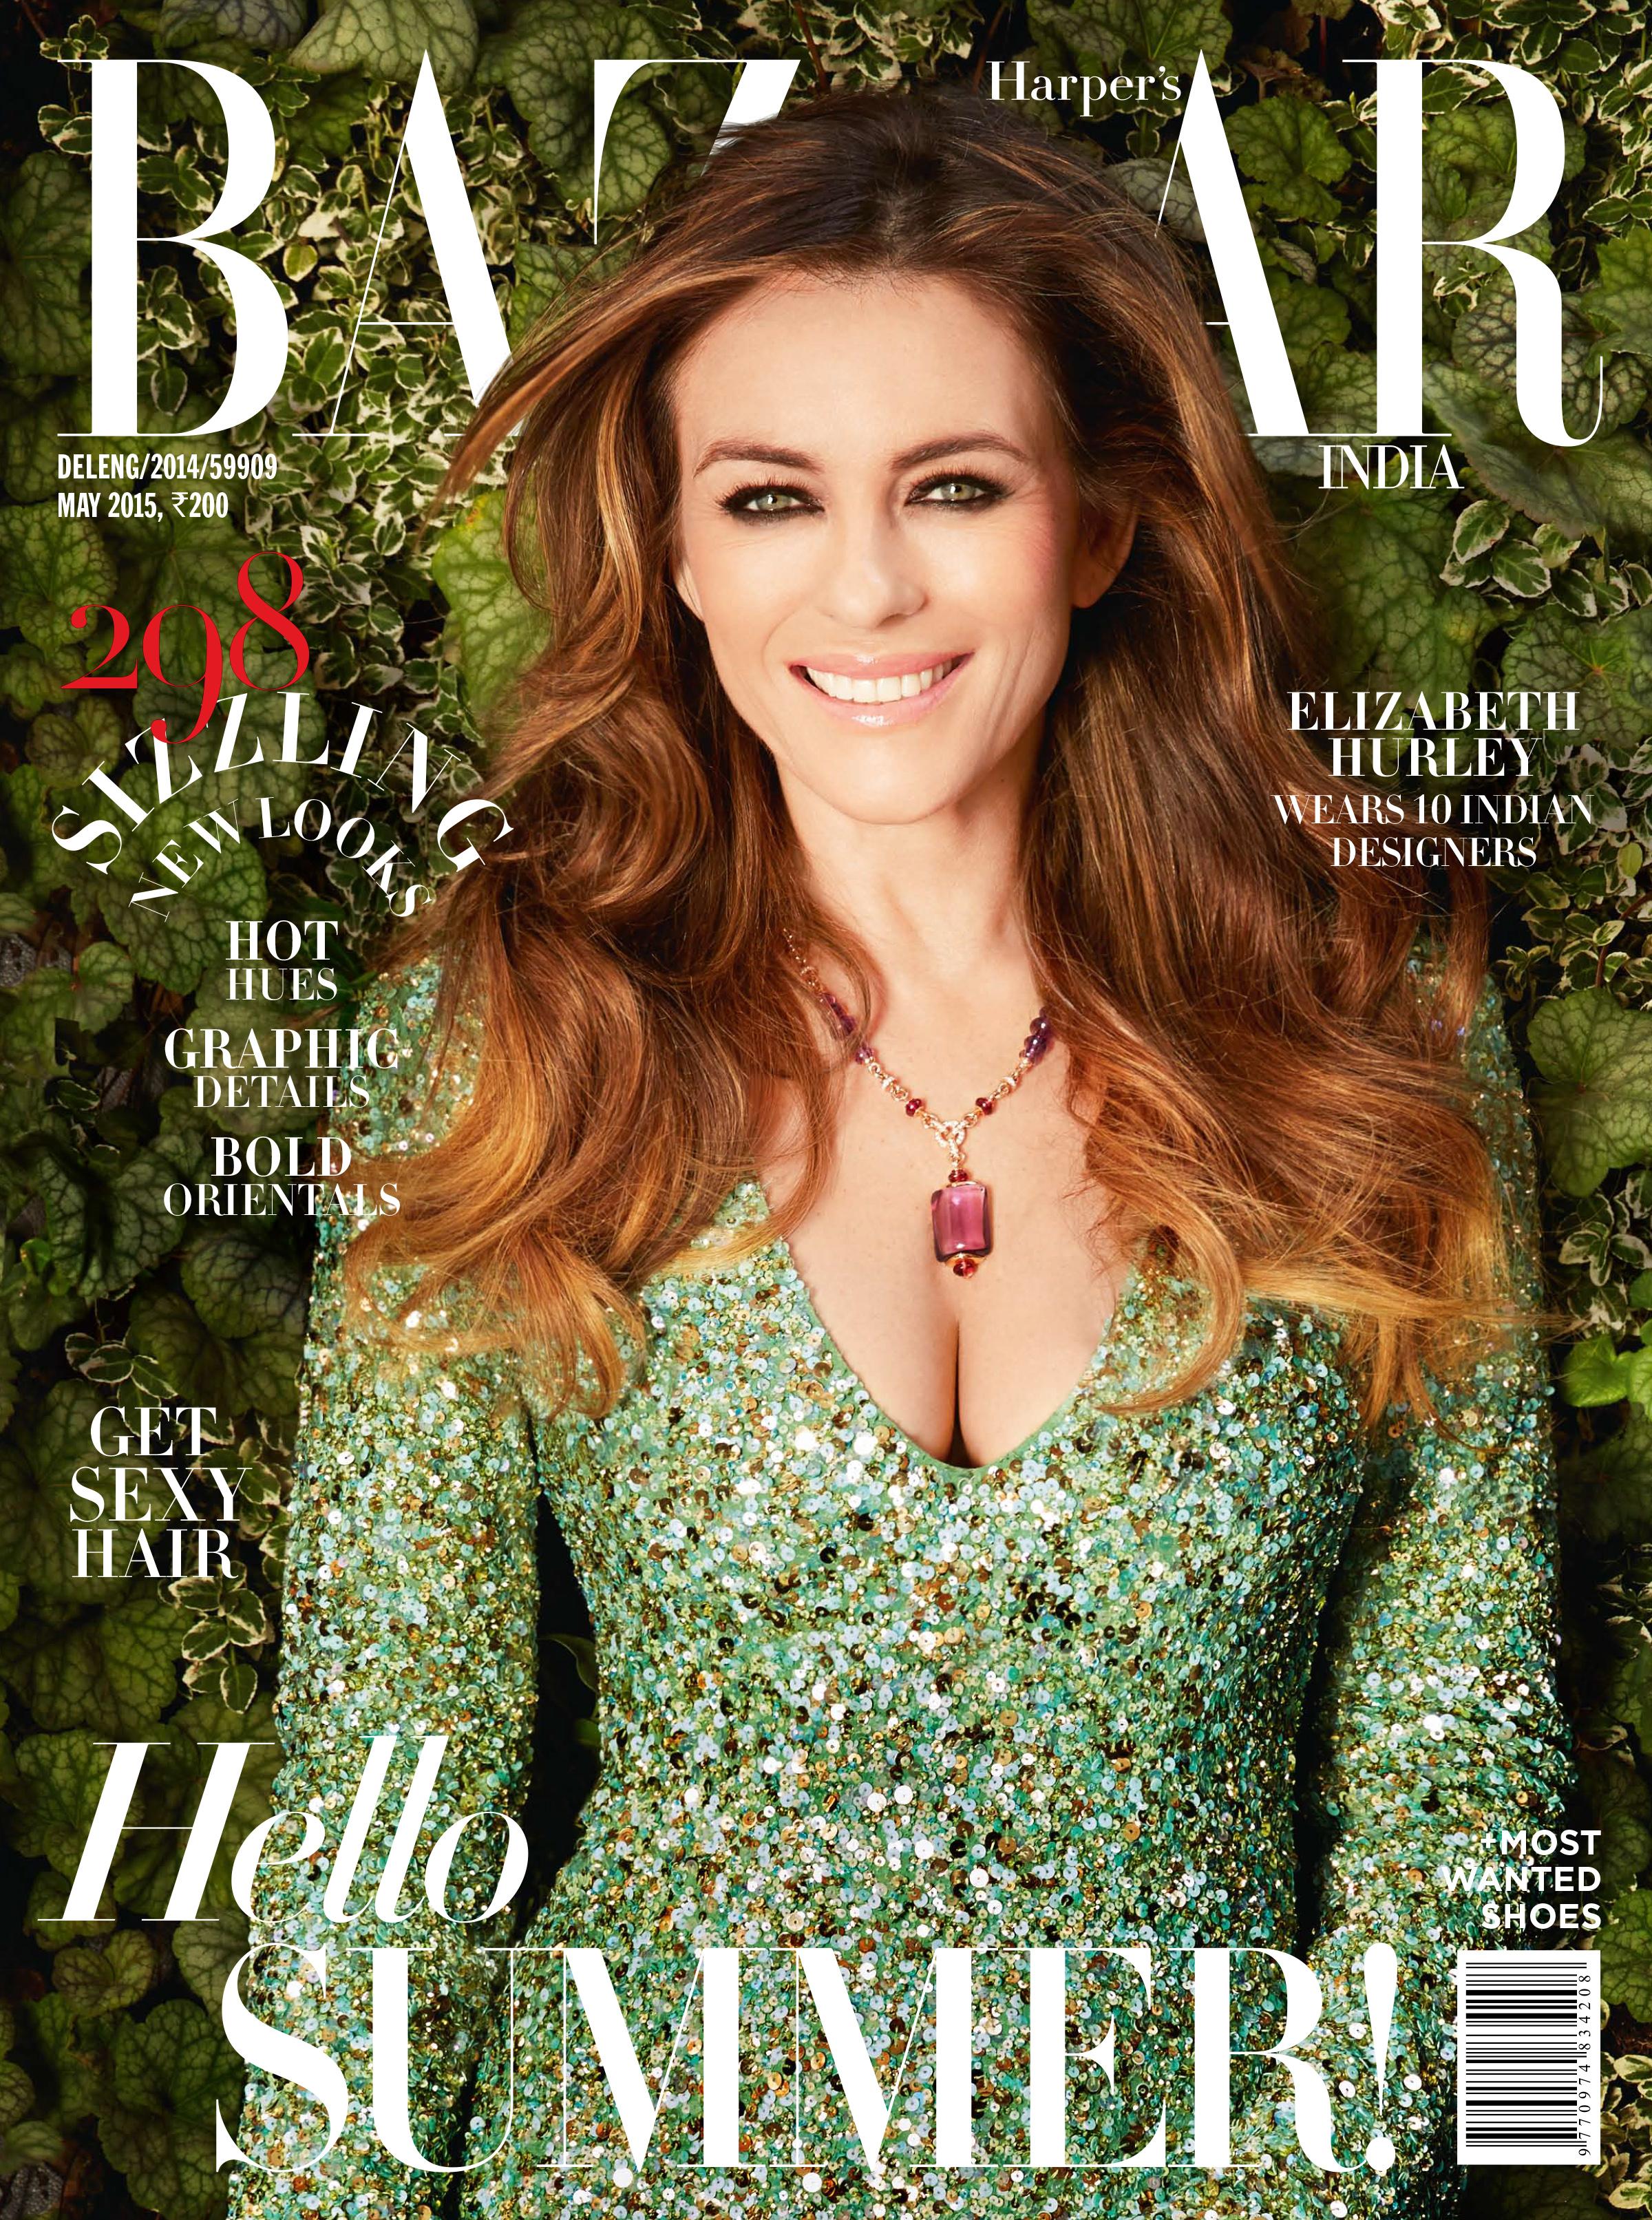 PC Harpers Bazaar May 15 Cover.jpg